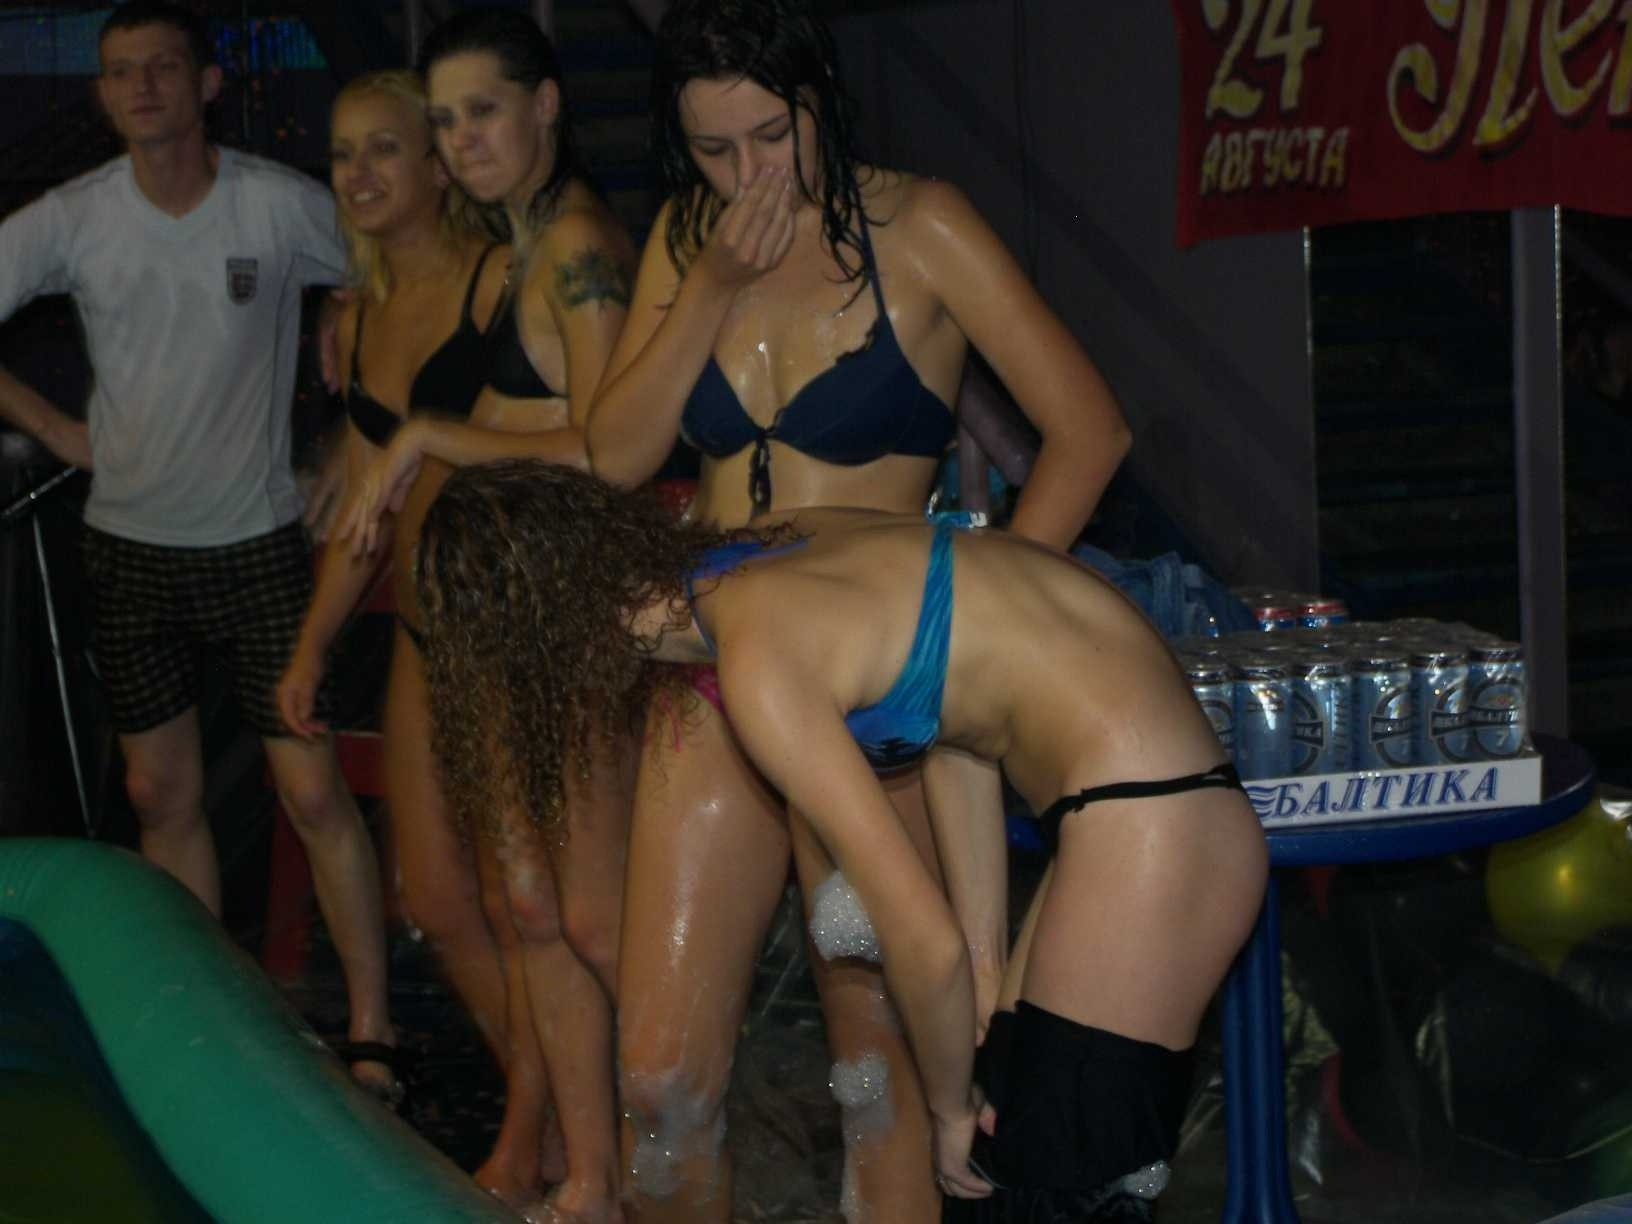 Эро фото на дискотеке, Порно вечеринки, фото секс пати, порно клуб 9 фотография